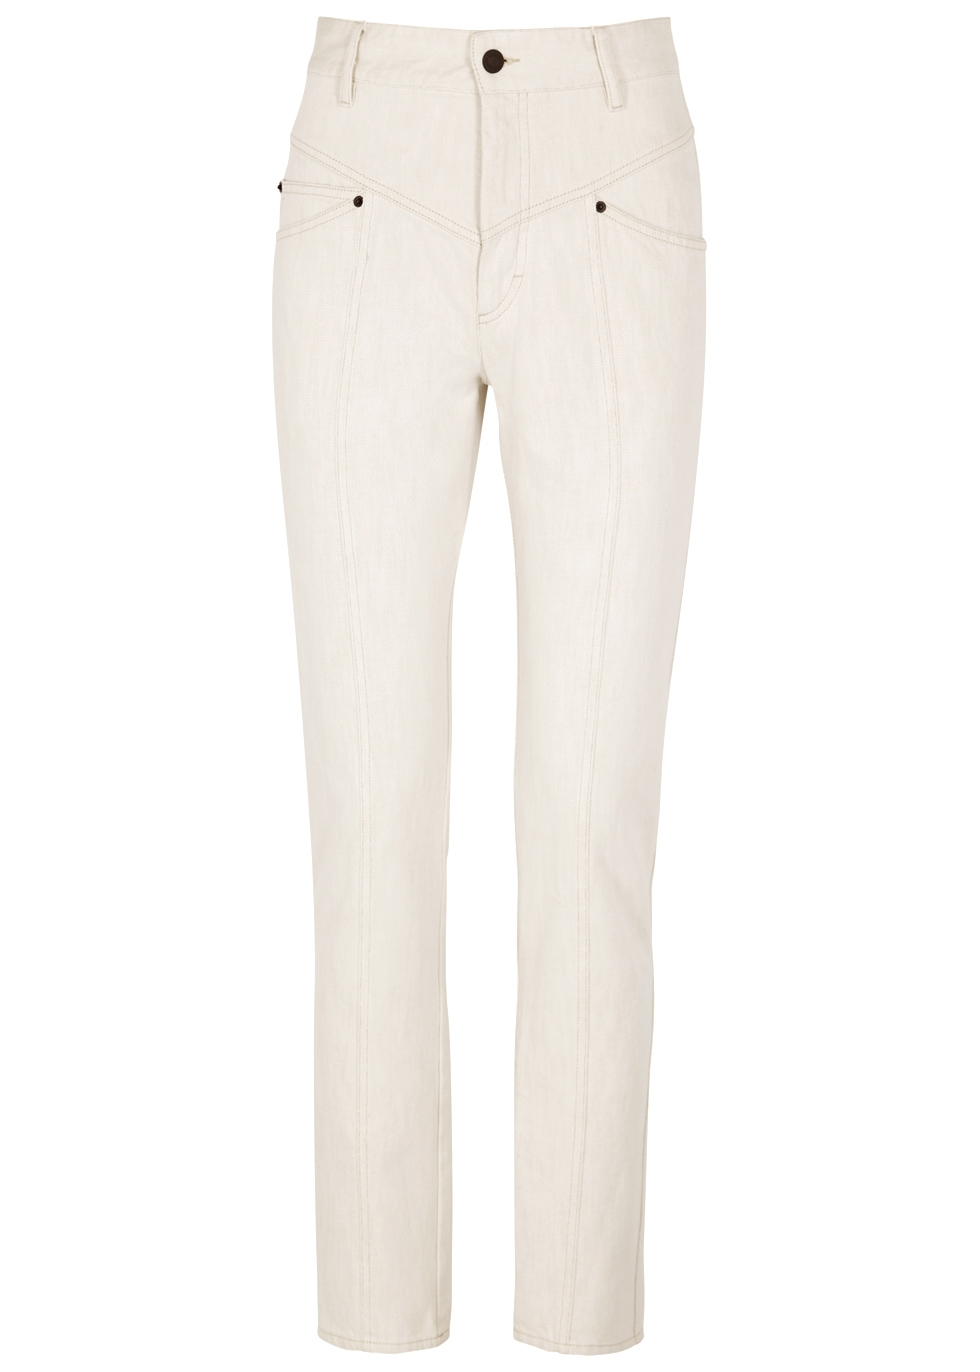 e64175607f20 Isabel Marant Étoile Lecce tan leather belt - Harvey Nichols